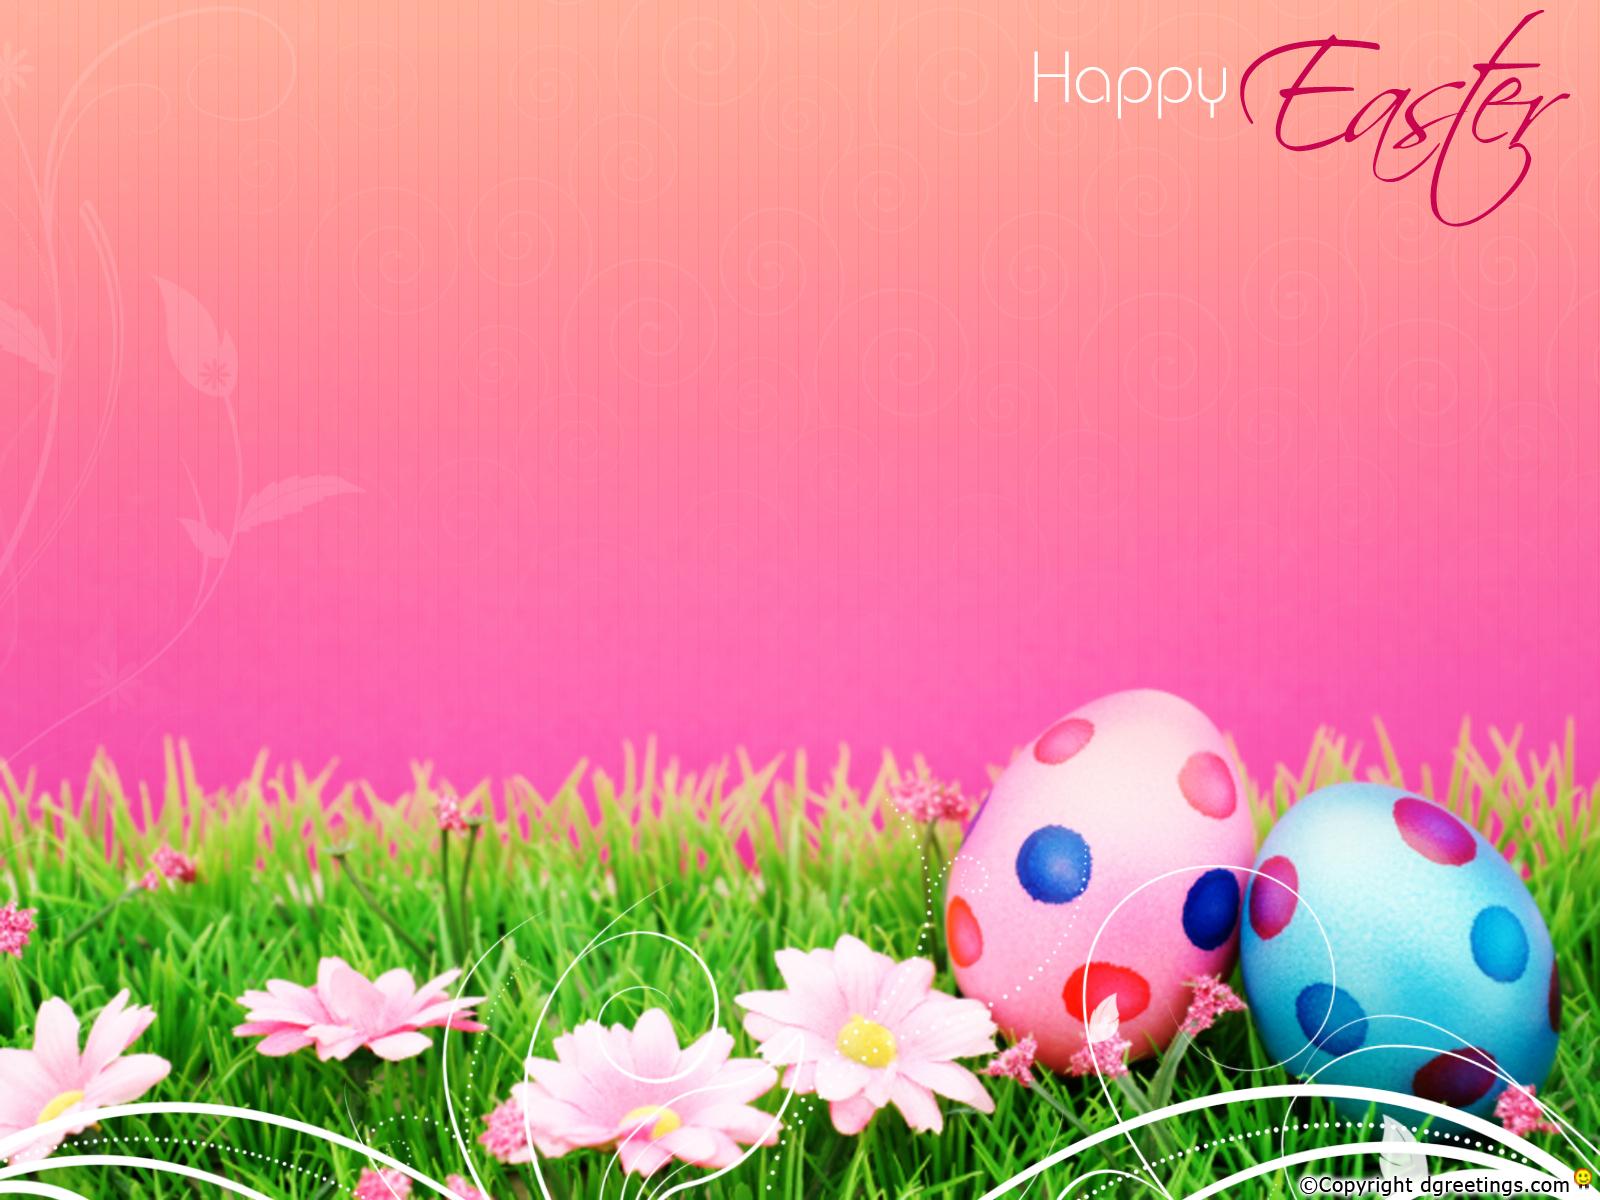 Free Download Happy Easter Desktop Backgrounds Christian